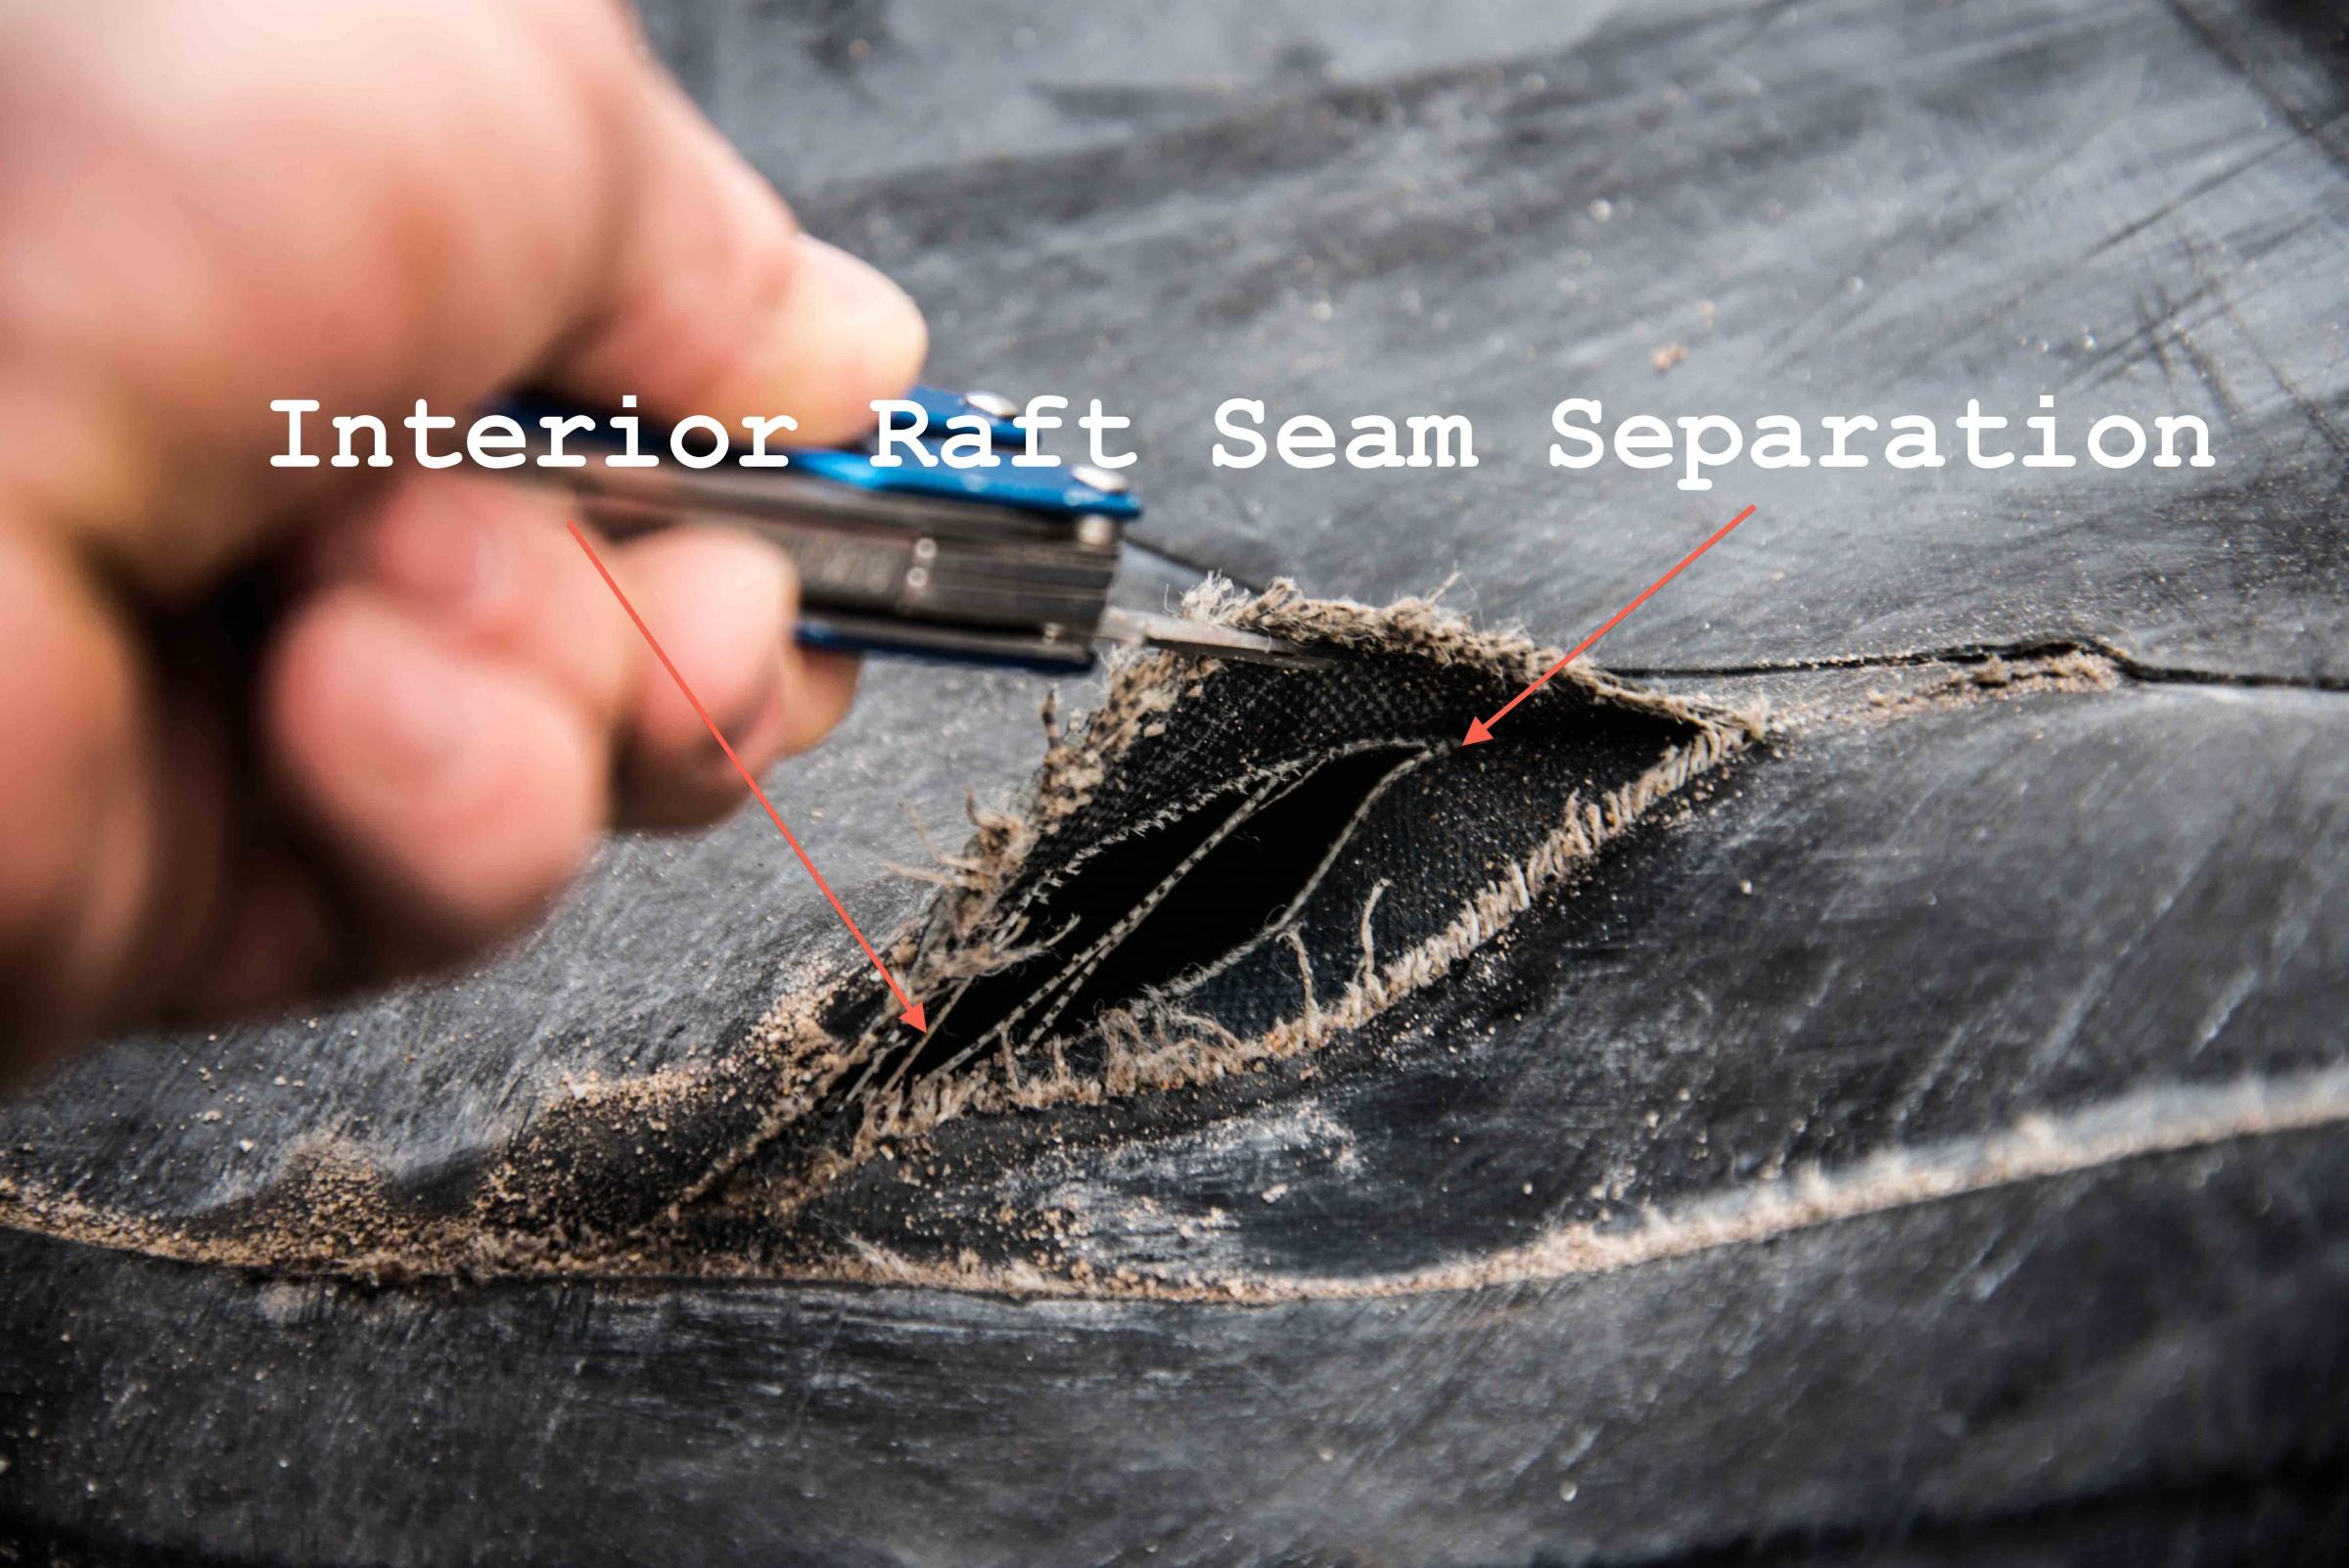 Click image for larger version  Name:Interior Raft Seam Sepration.jpg Views:162 Size:989.9 KB ID:8618